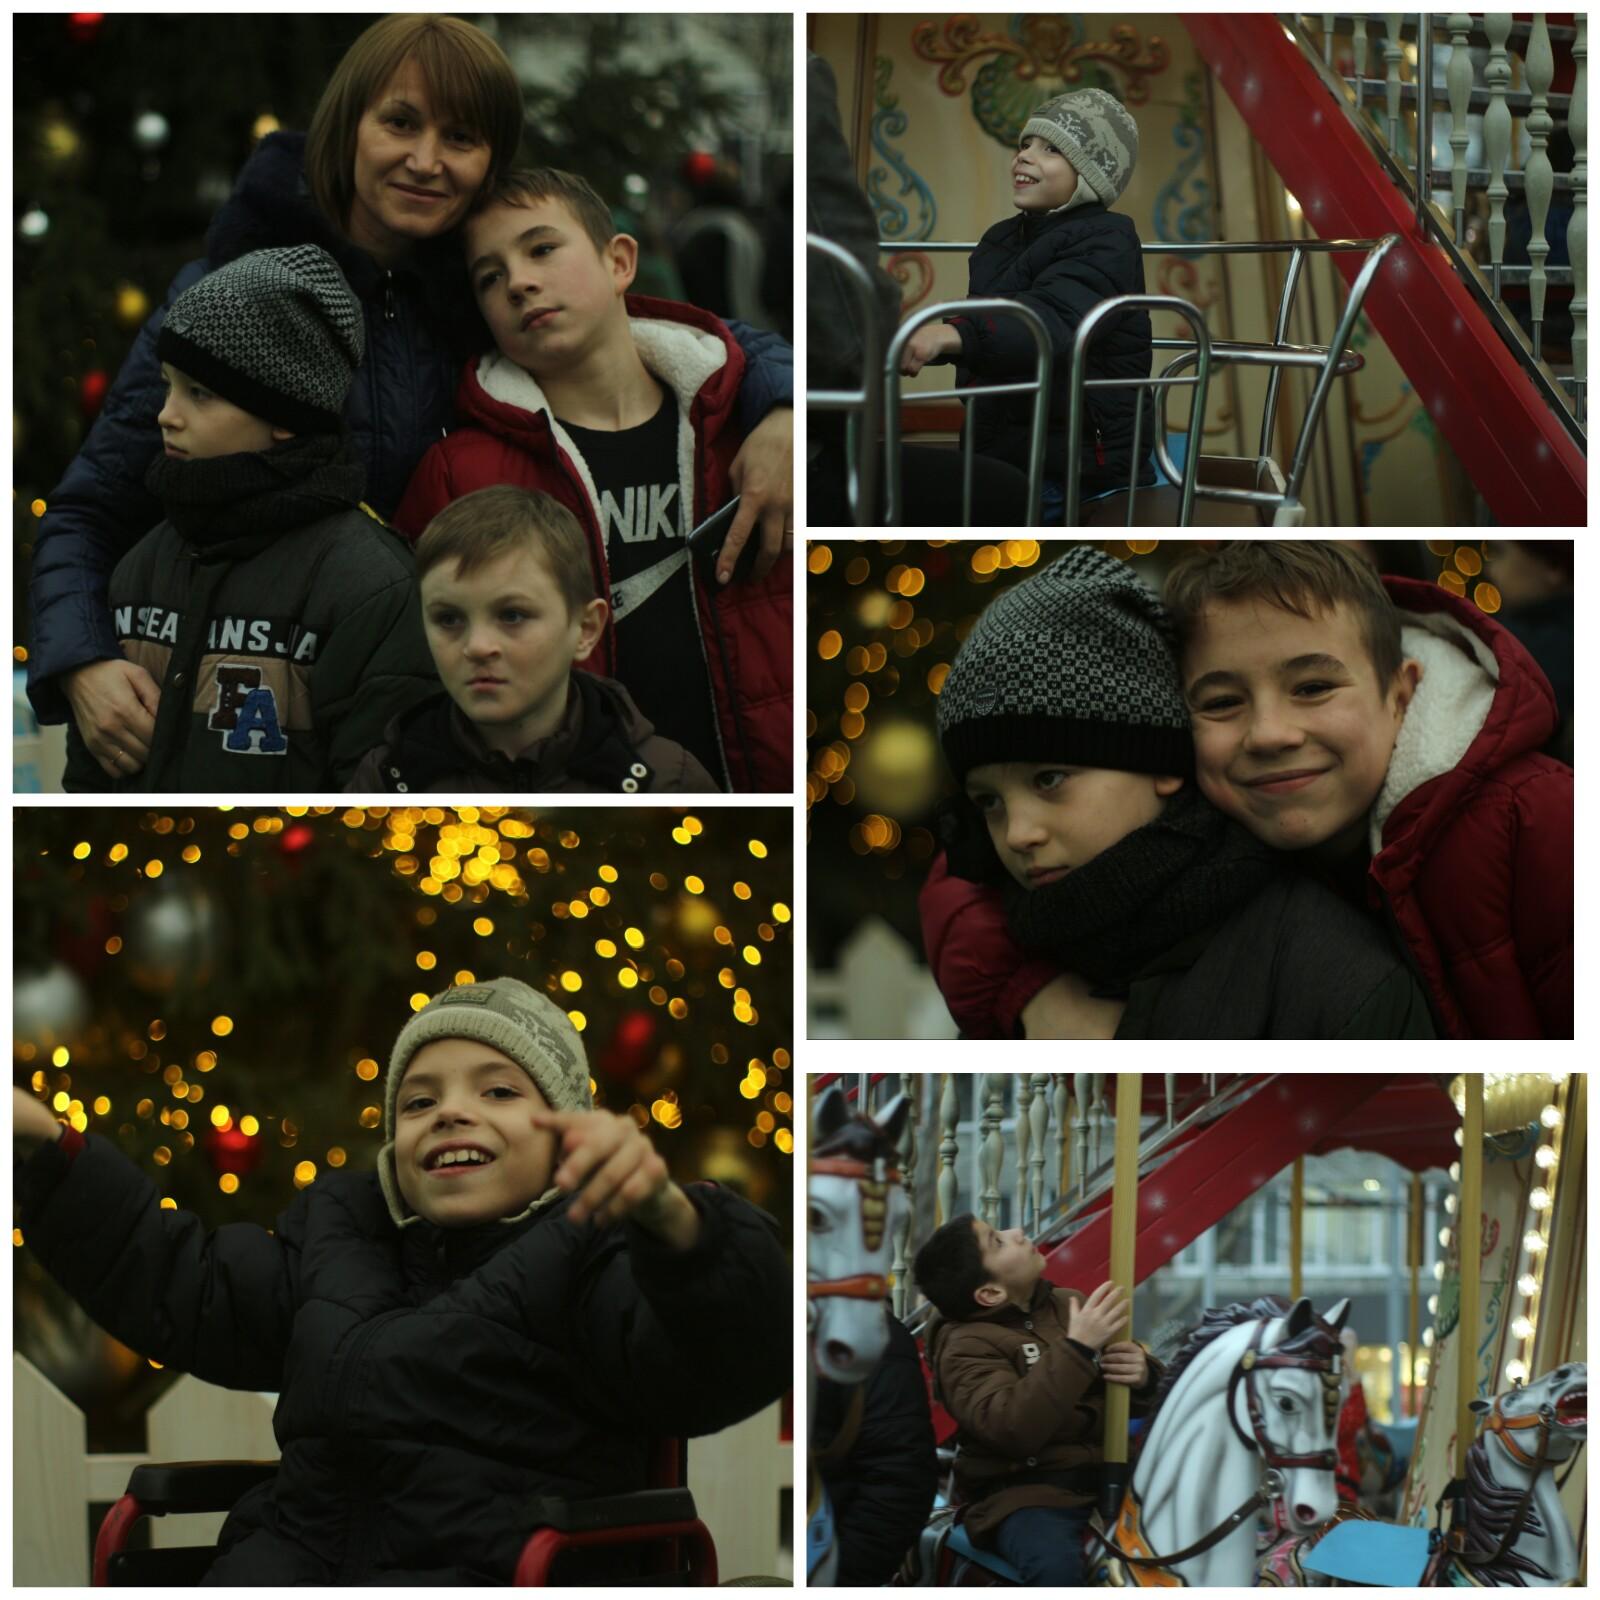 Bring Christmas to Moldova 2018 by 979f39a8b32c980c315033ec08150dfa627a8d34 fundraising photo 2